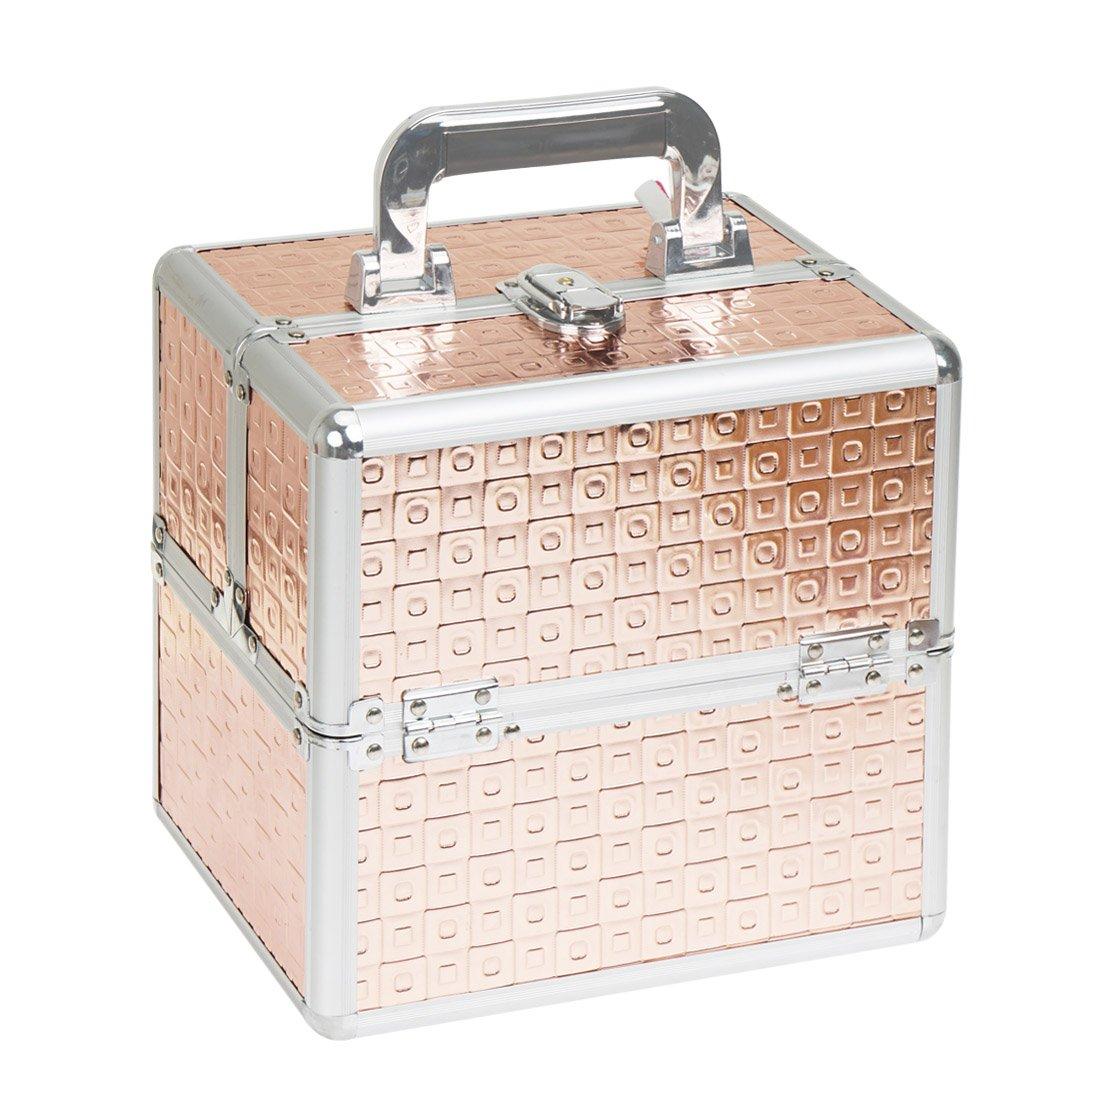 Makeup Train Cases Professional Large Make Up Boxes Artist Organizer Kit Makeup Cases (Gold) [ US STOCK ]